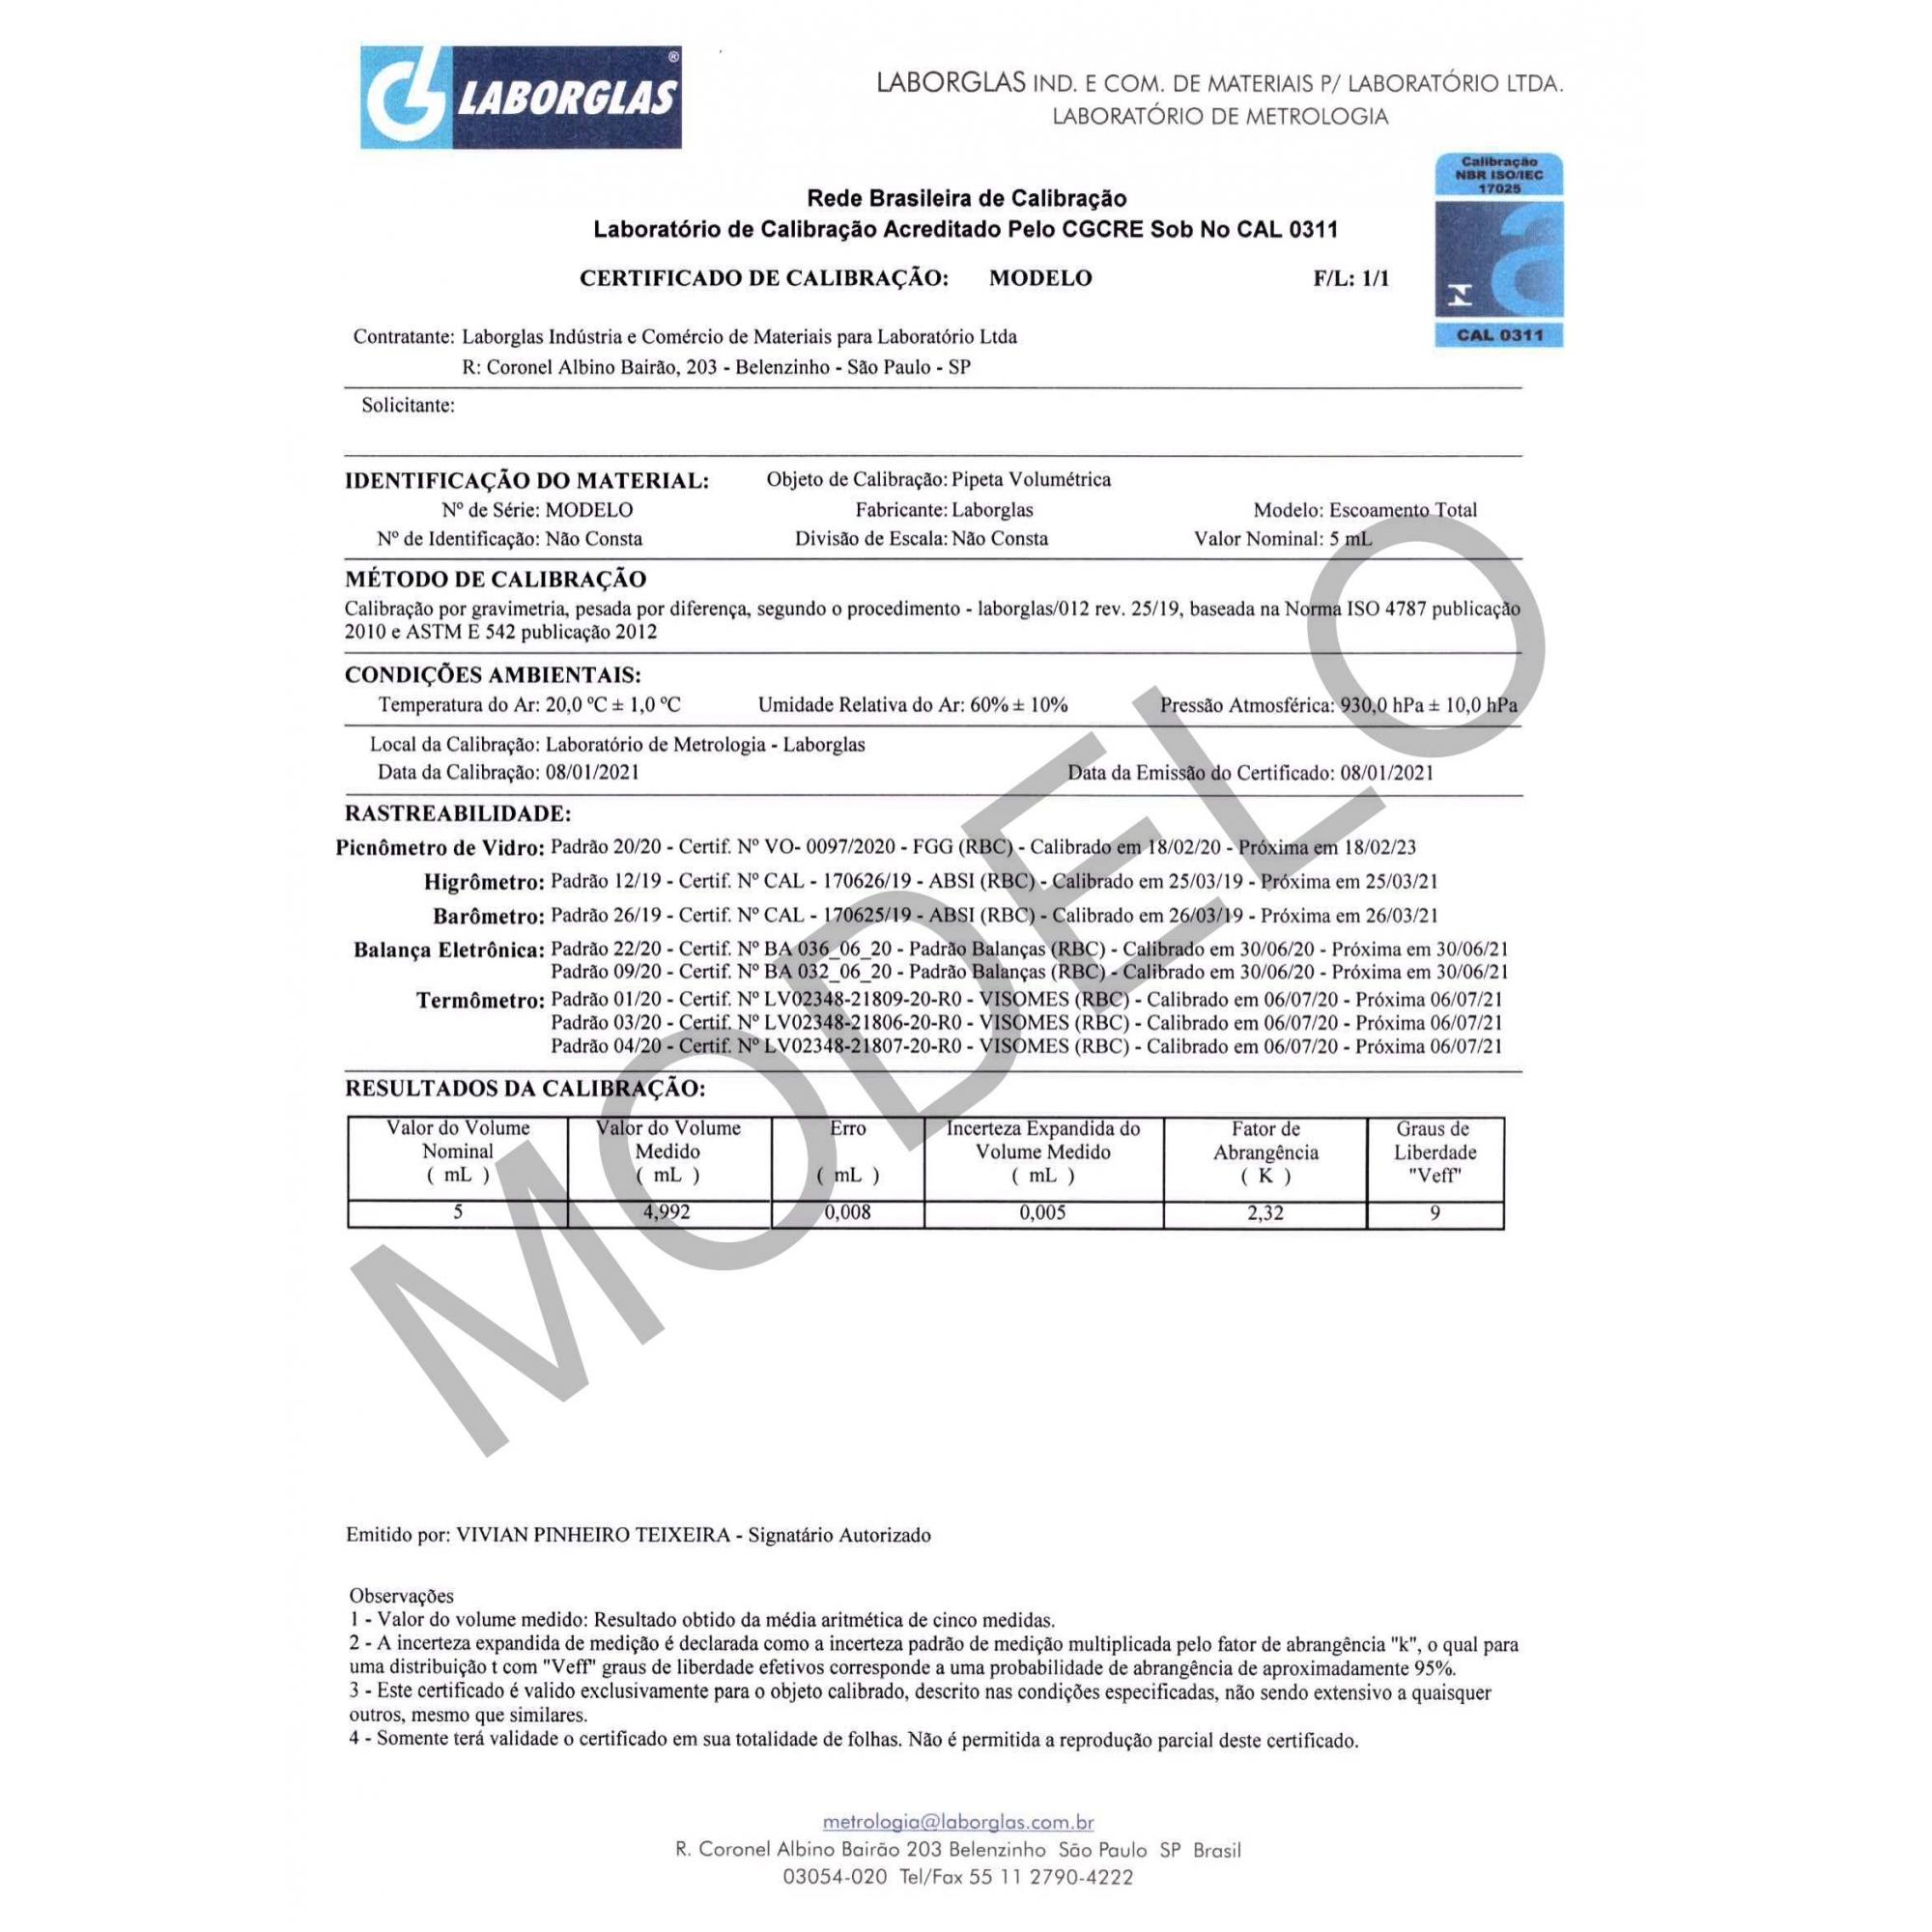 PIPETA VOLUMÉTRICA ESGOTAMENTO TOTAL 3 ML CERTIFICADO RBC - Laborglas - Cód. 9433704-R